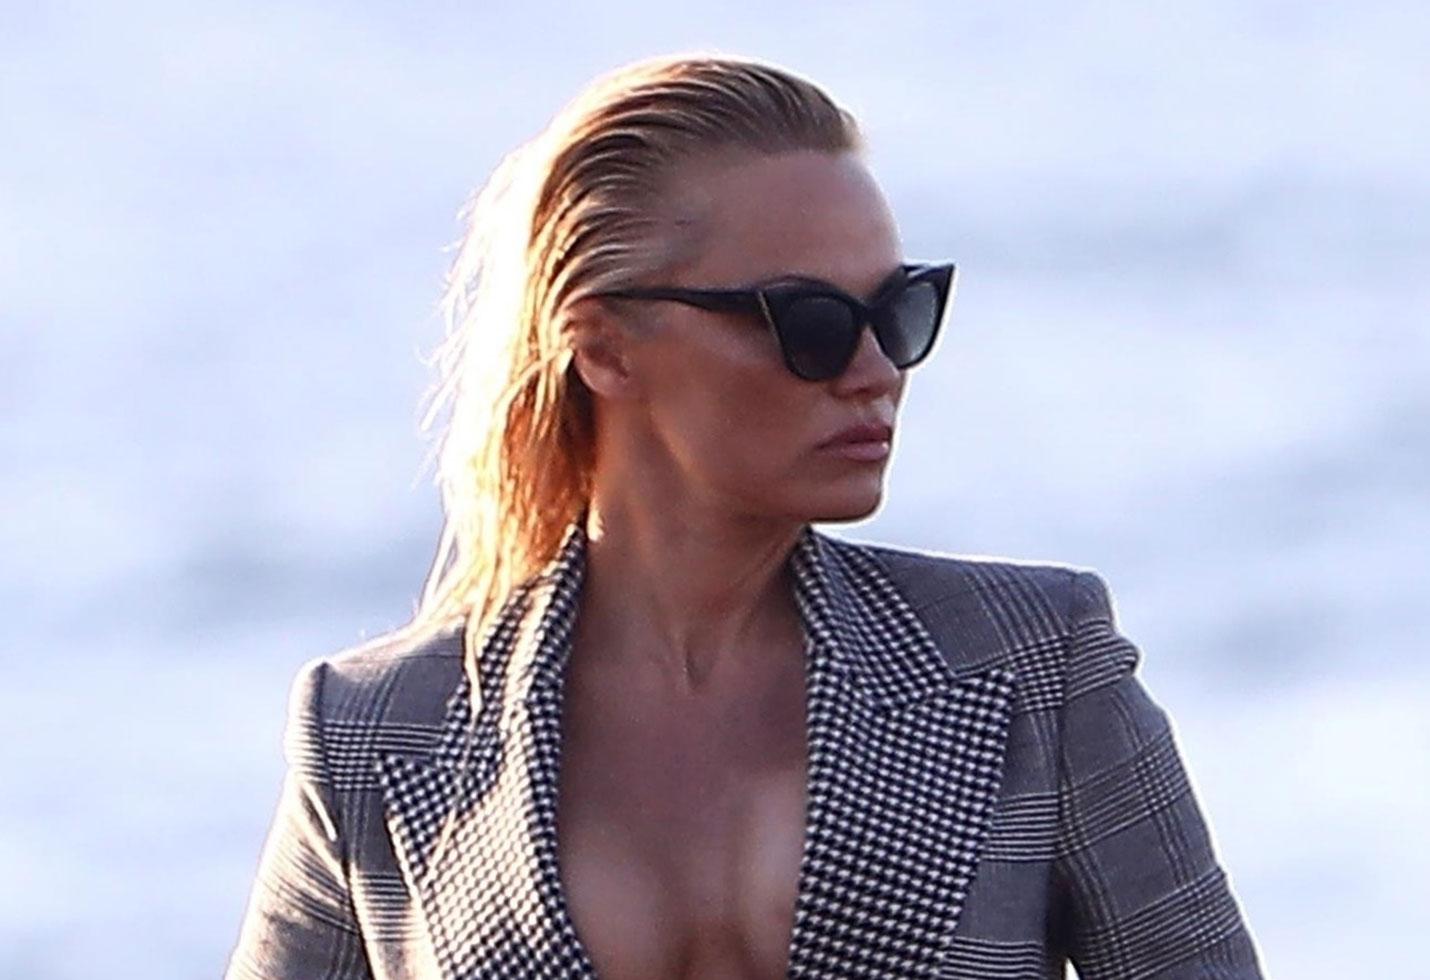 Pamela anderson nip slip boobs photoshoot